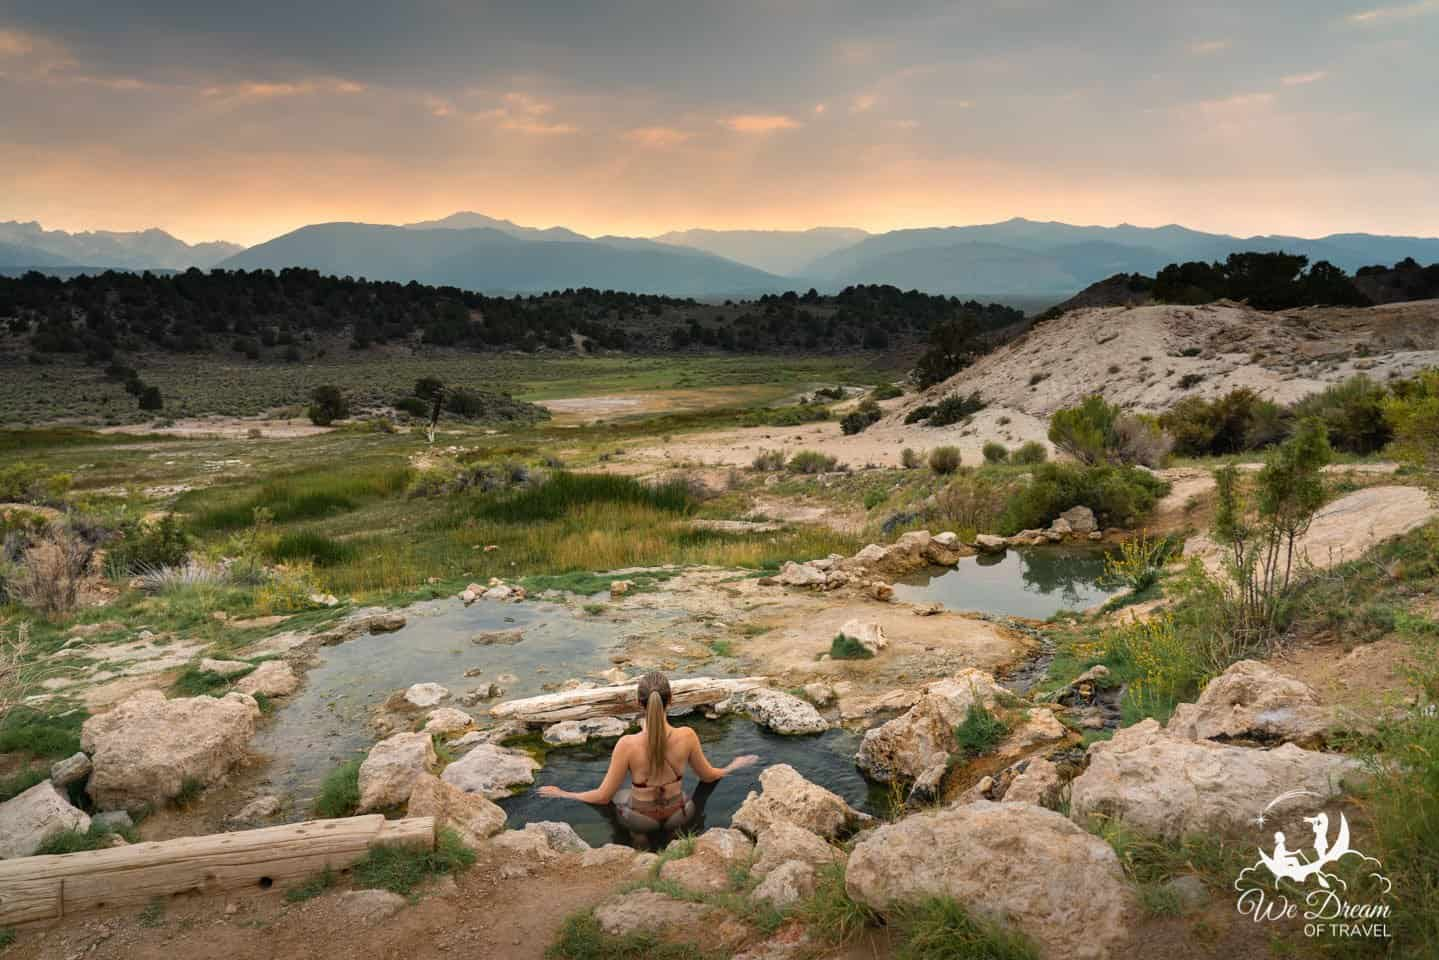 Secret hot springs at sunset at Travertine Hot Springs.